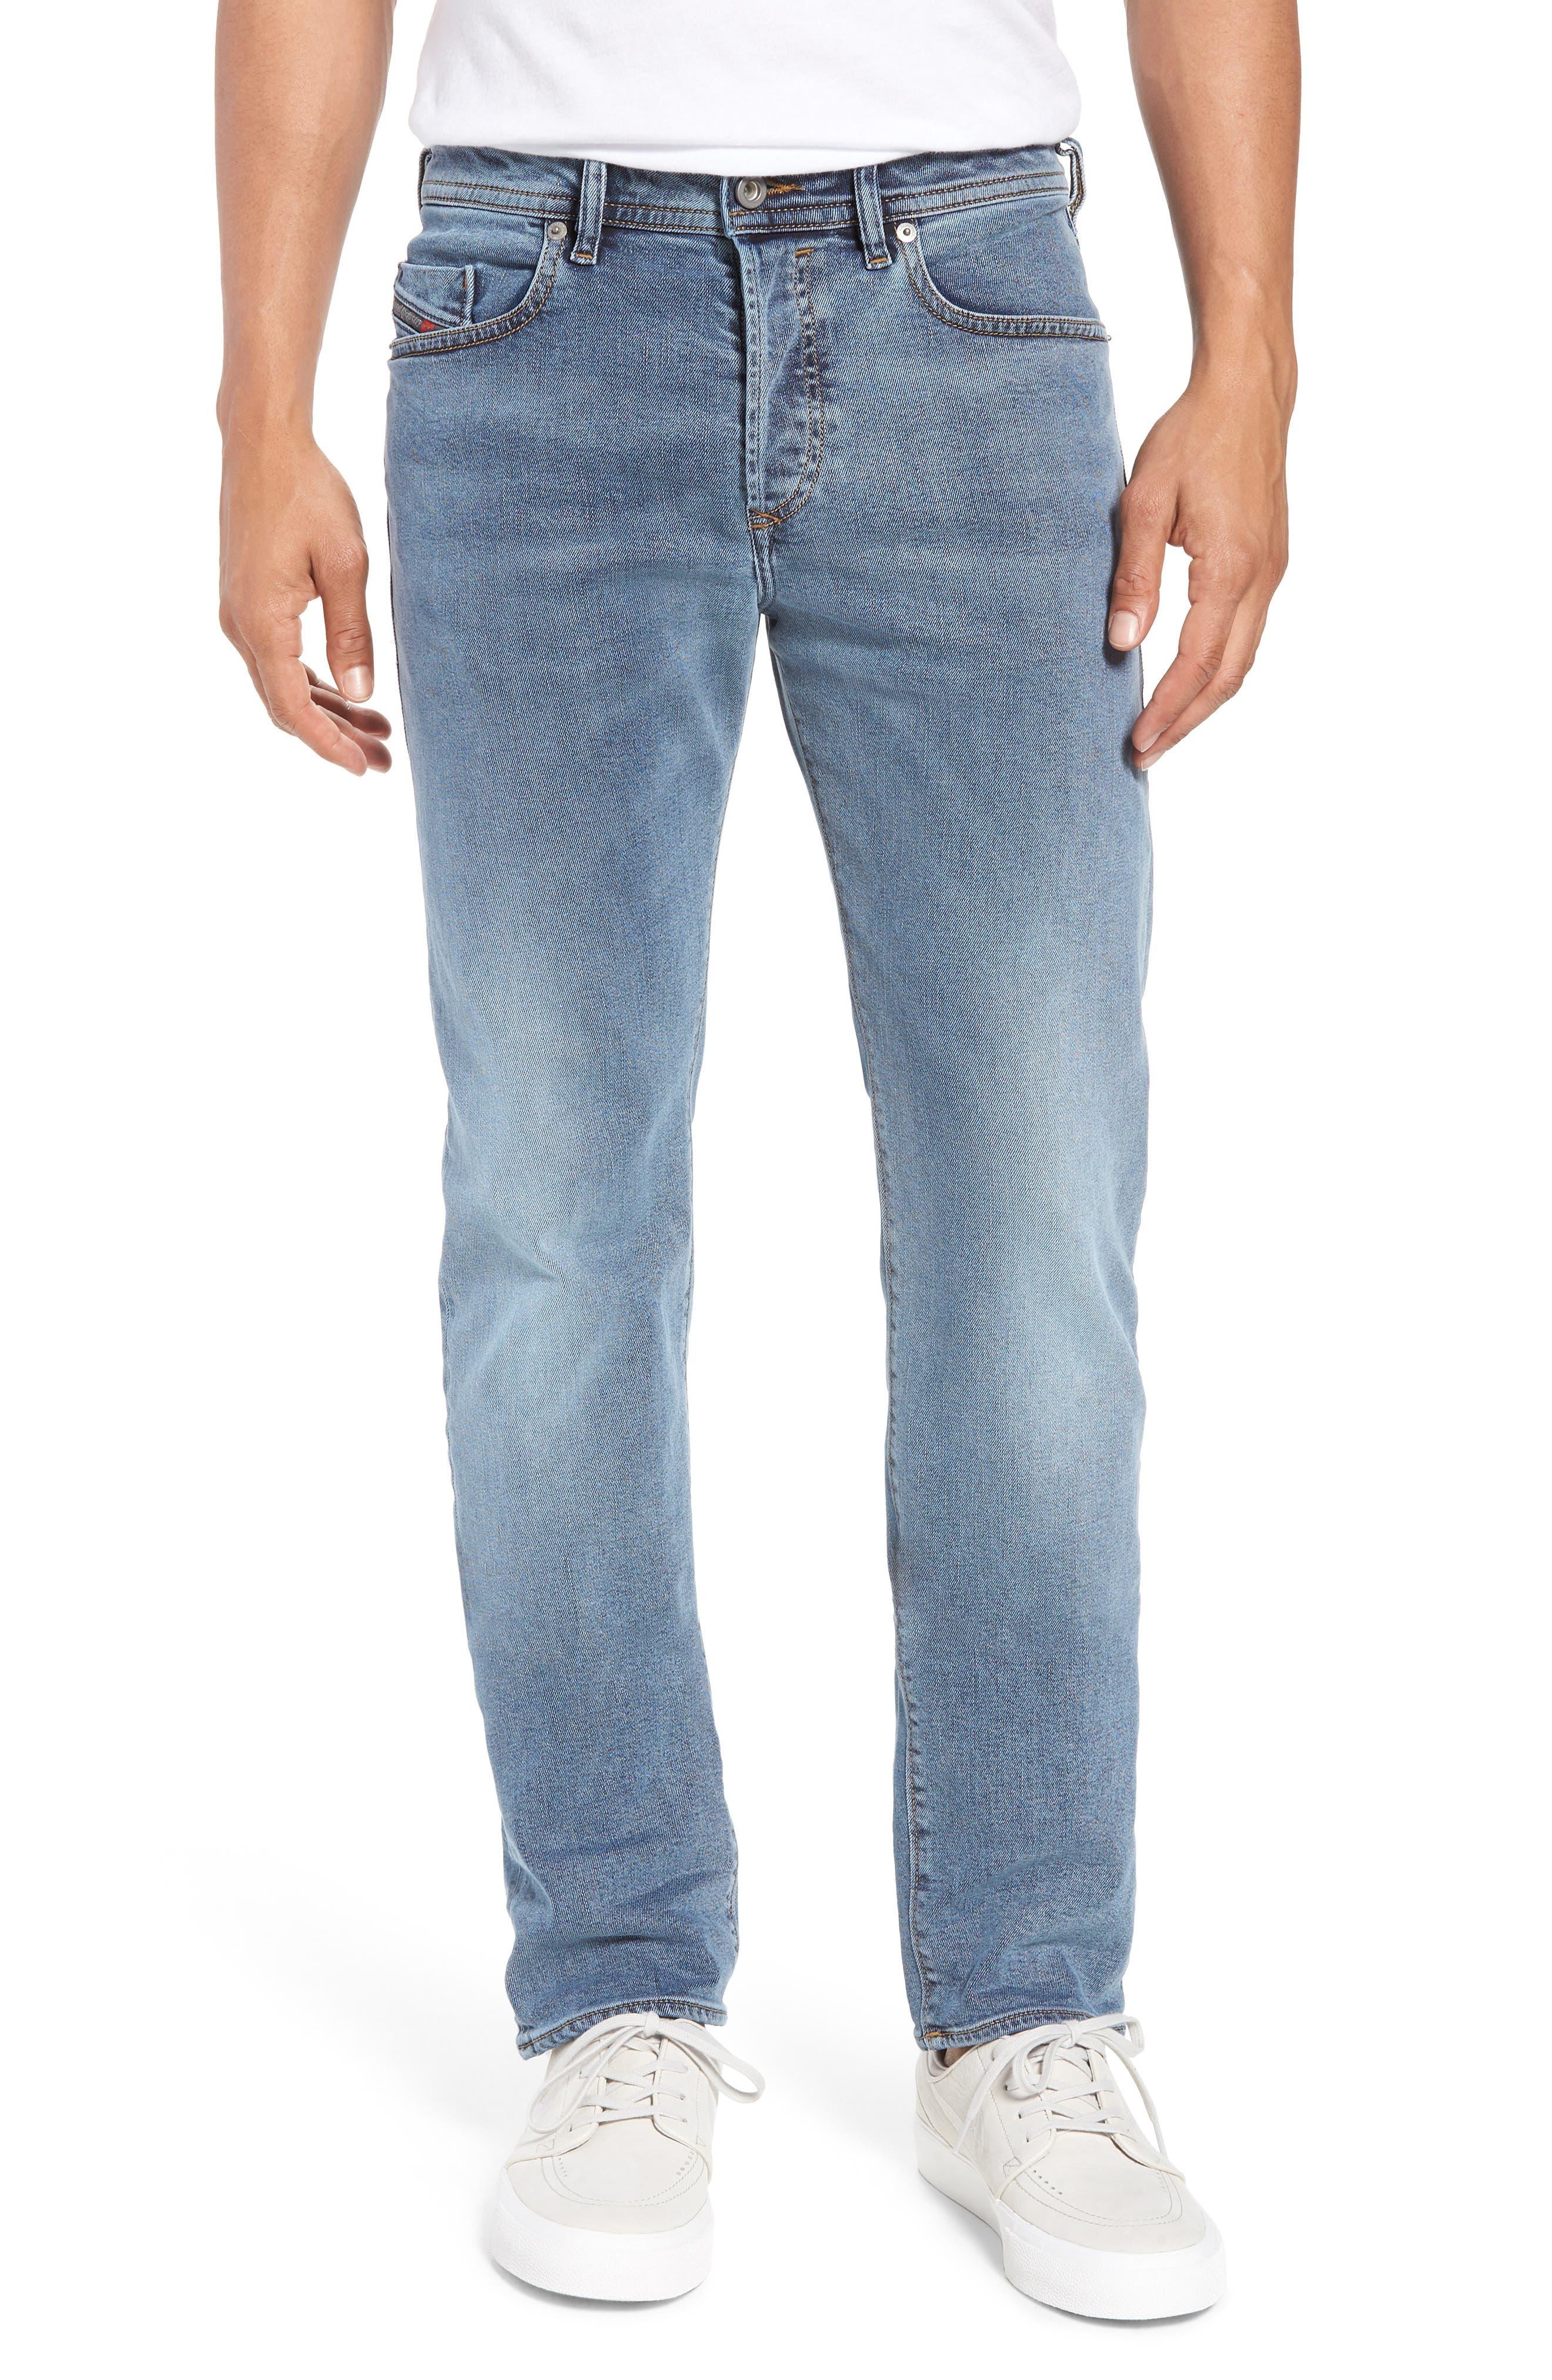 Buster Slim Straight Leg Jeans,                         Main,                         color, 084Sj